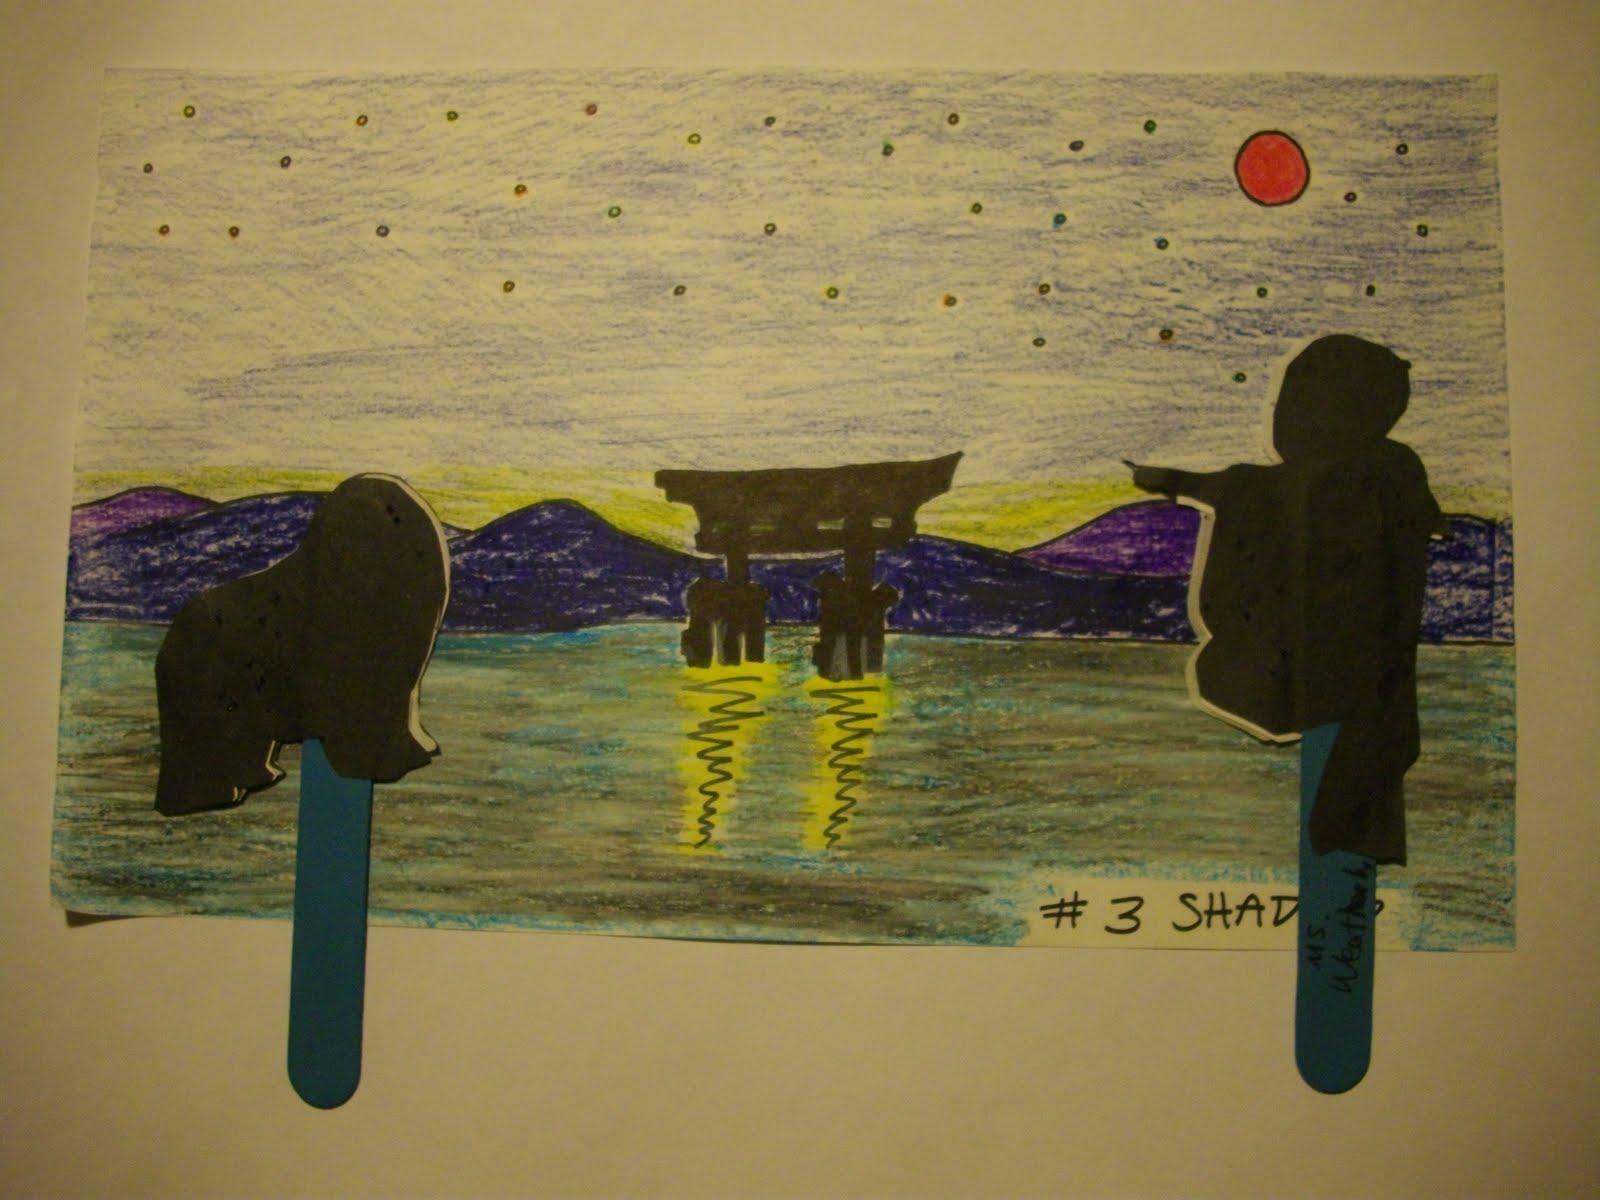 http://4.bp.blogspot.com/_DTl9xooNtmY/SwDaHS_8vWI/AAAAAAAAABQ/Wb6B87h1jsE/s1600/ShadowPuppetMockUp-1.jpg